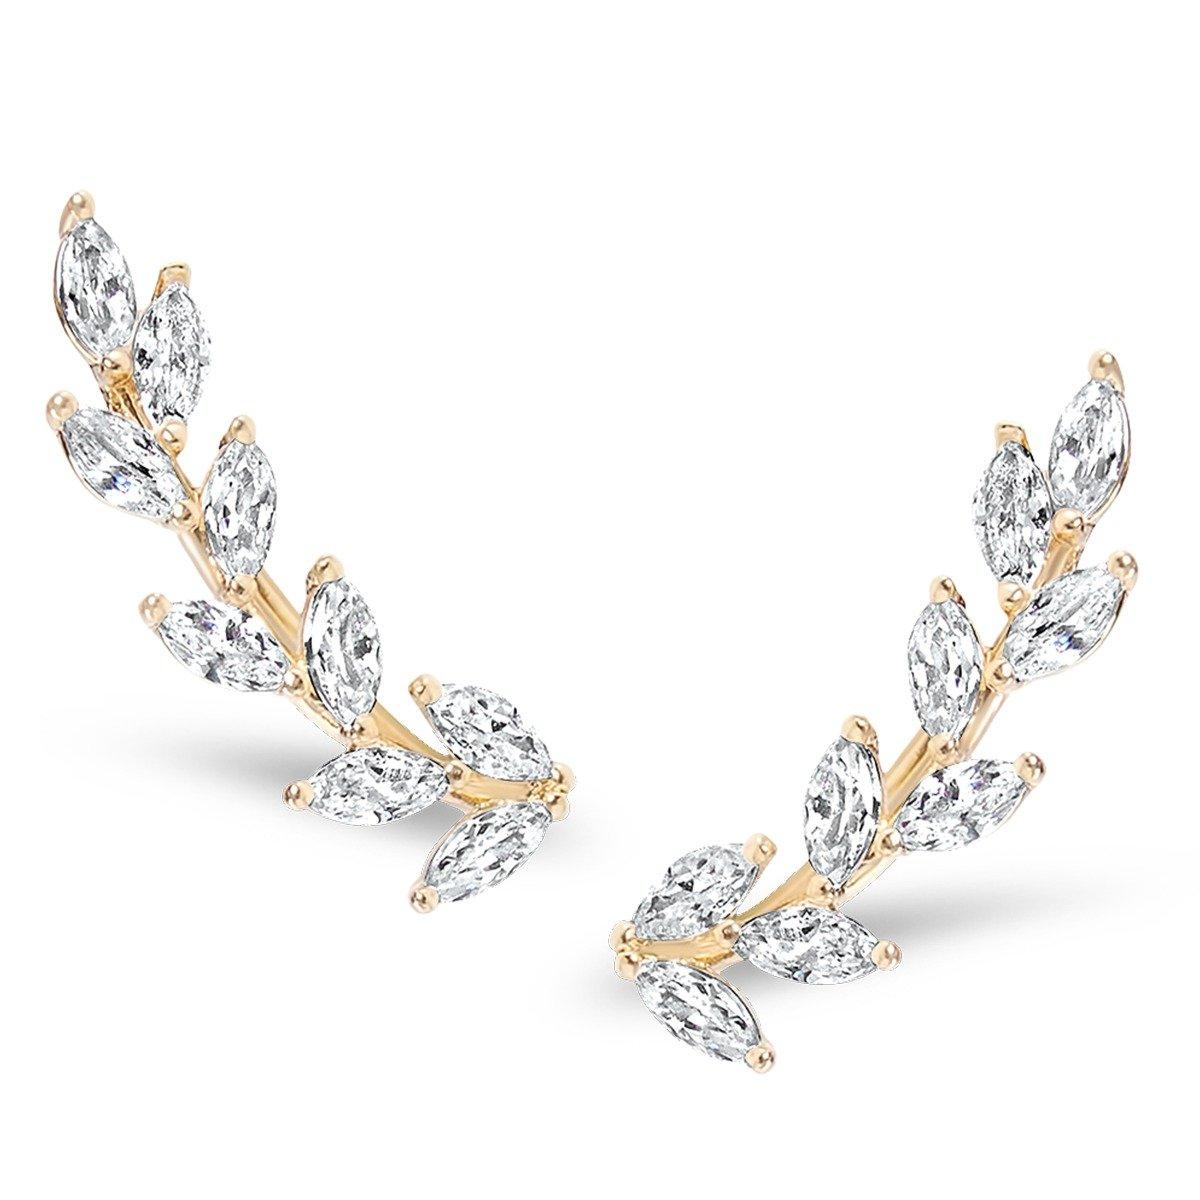 Humble Chic Crystal Leaf Ear Climbers - Simulated Diamond Flower Crawler Cuff Stud Earrings, Gold-Tone Petals